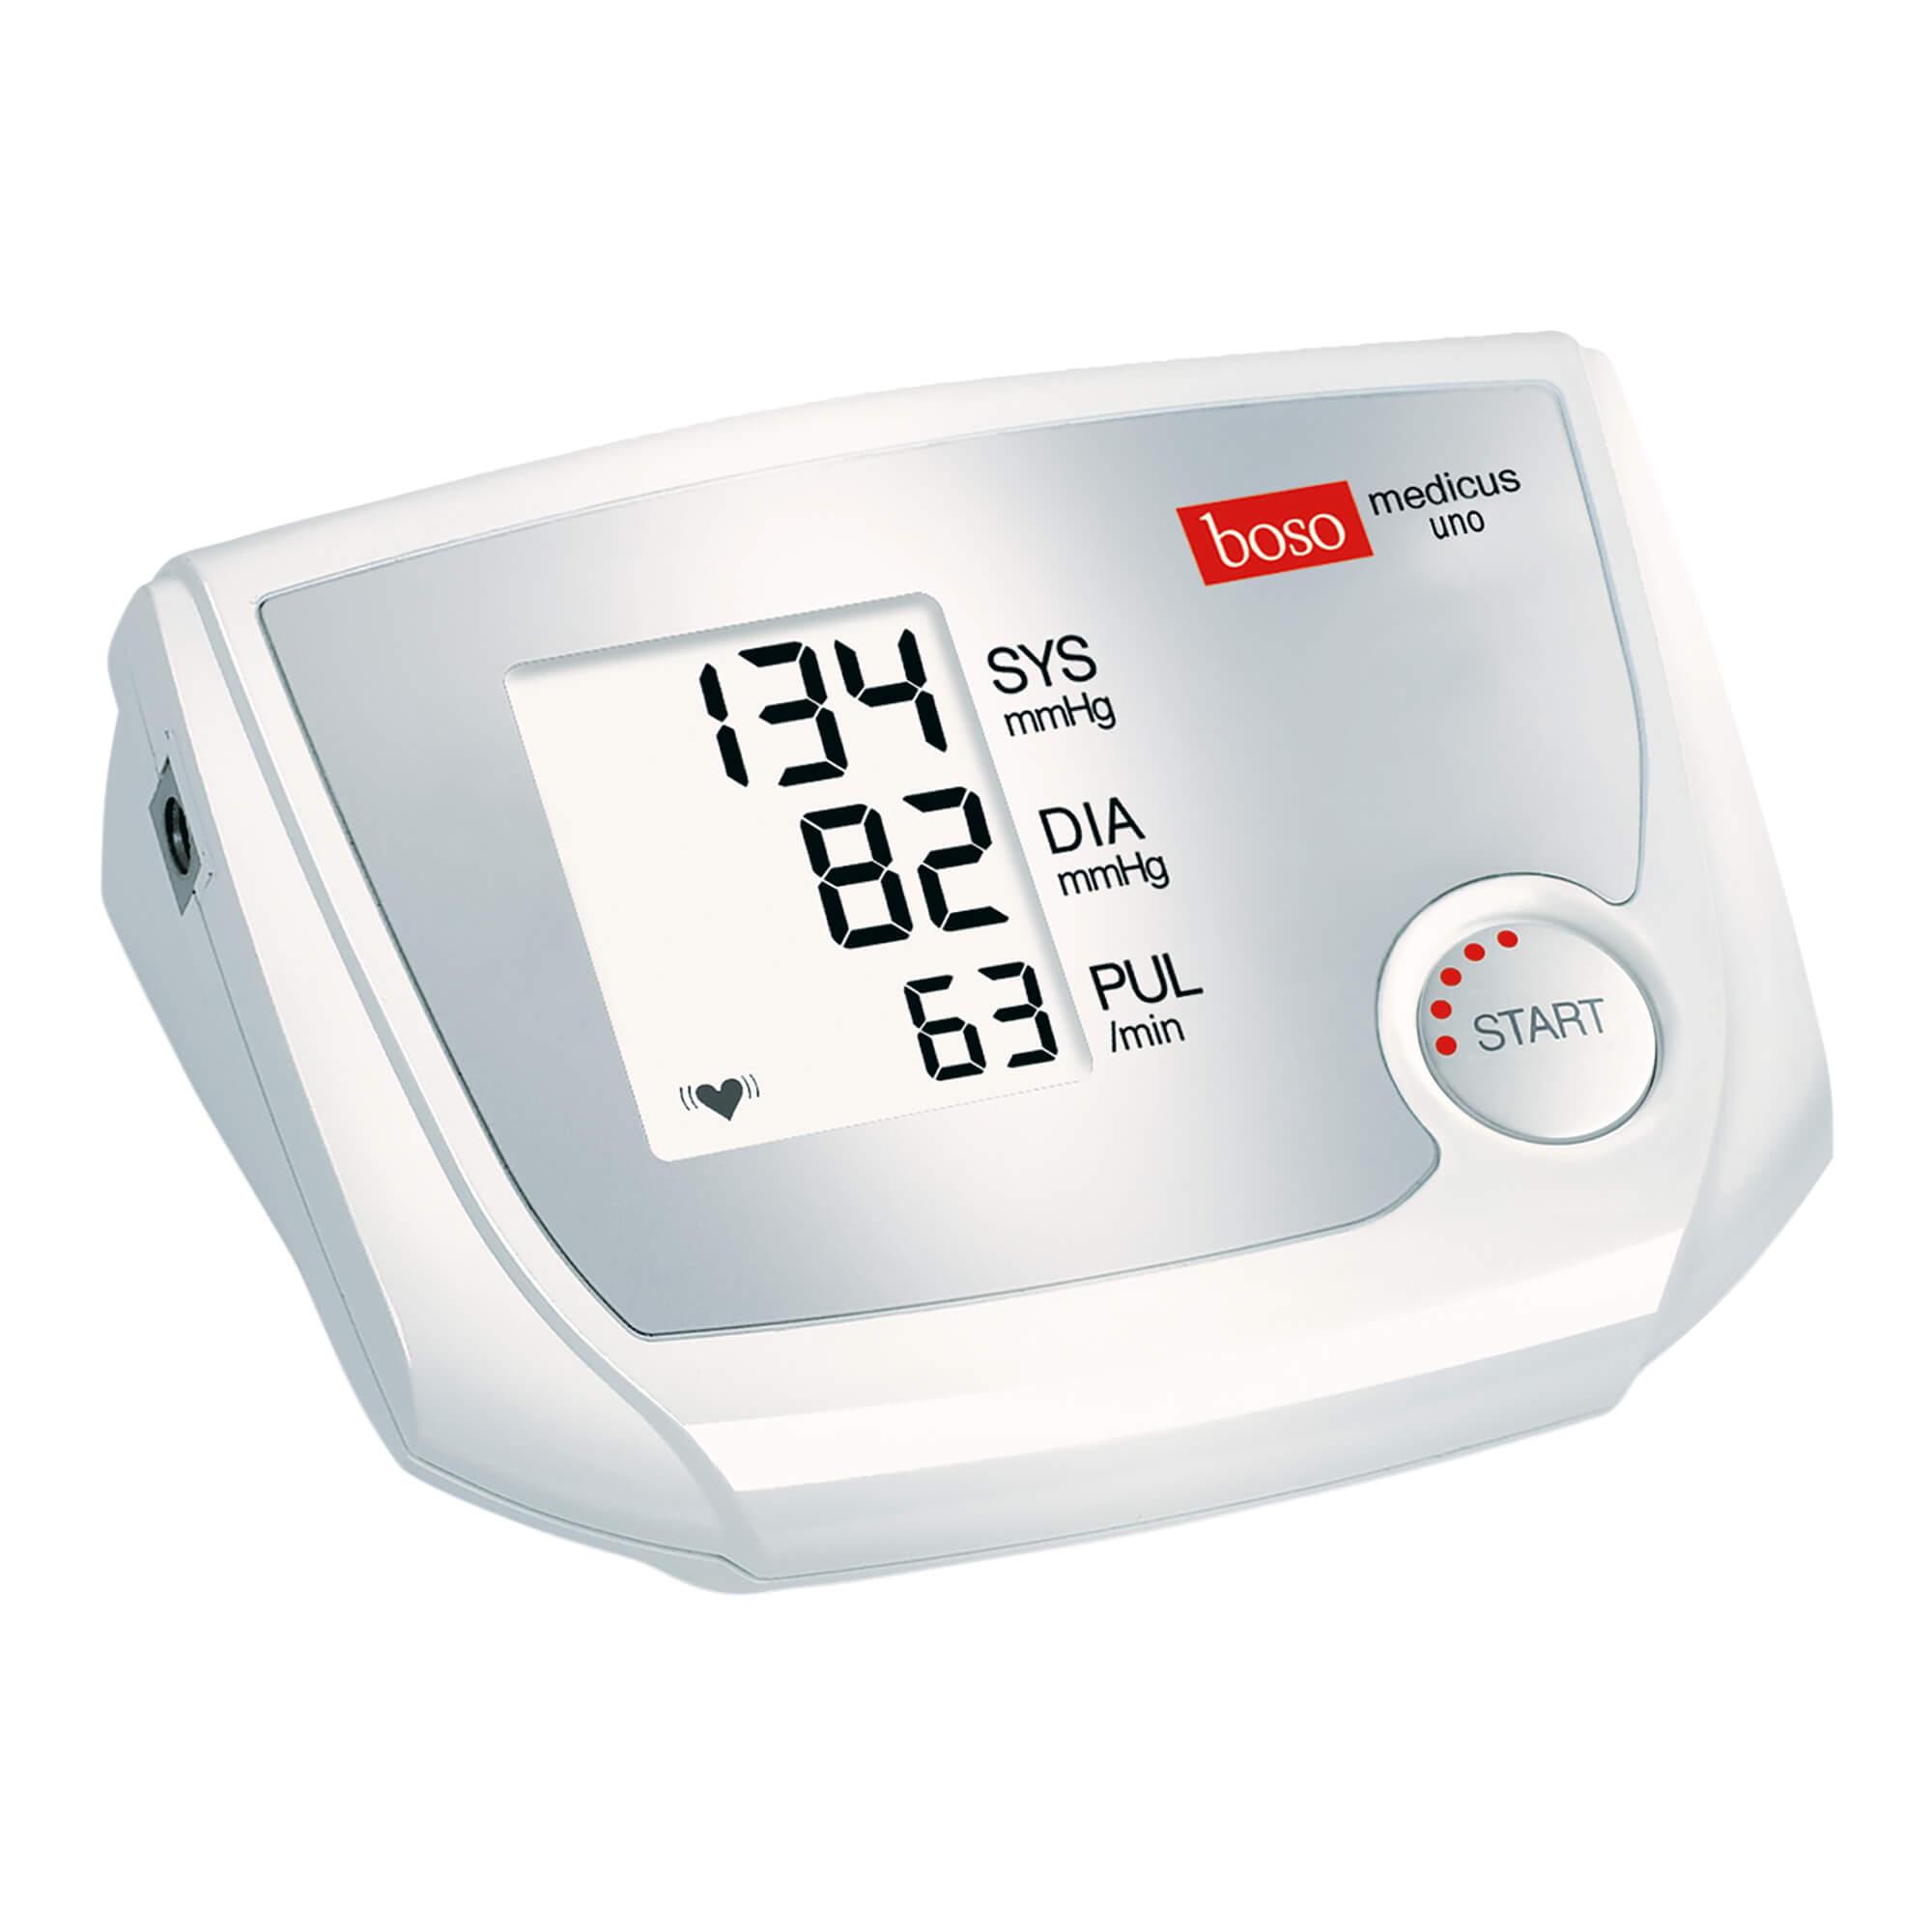 Boso Medicus Uno vollautomatisches Blutdruckmessgerät